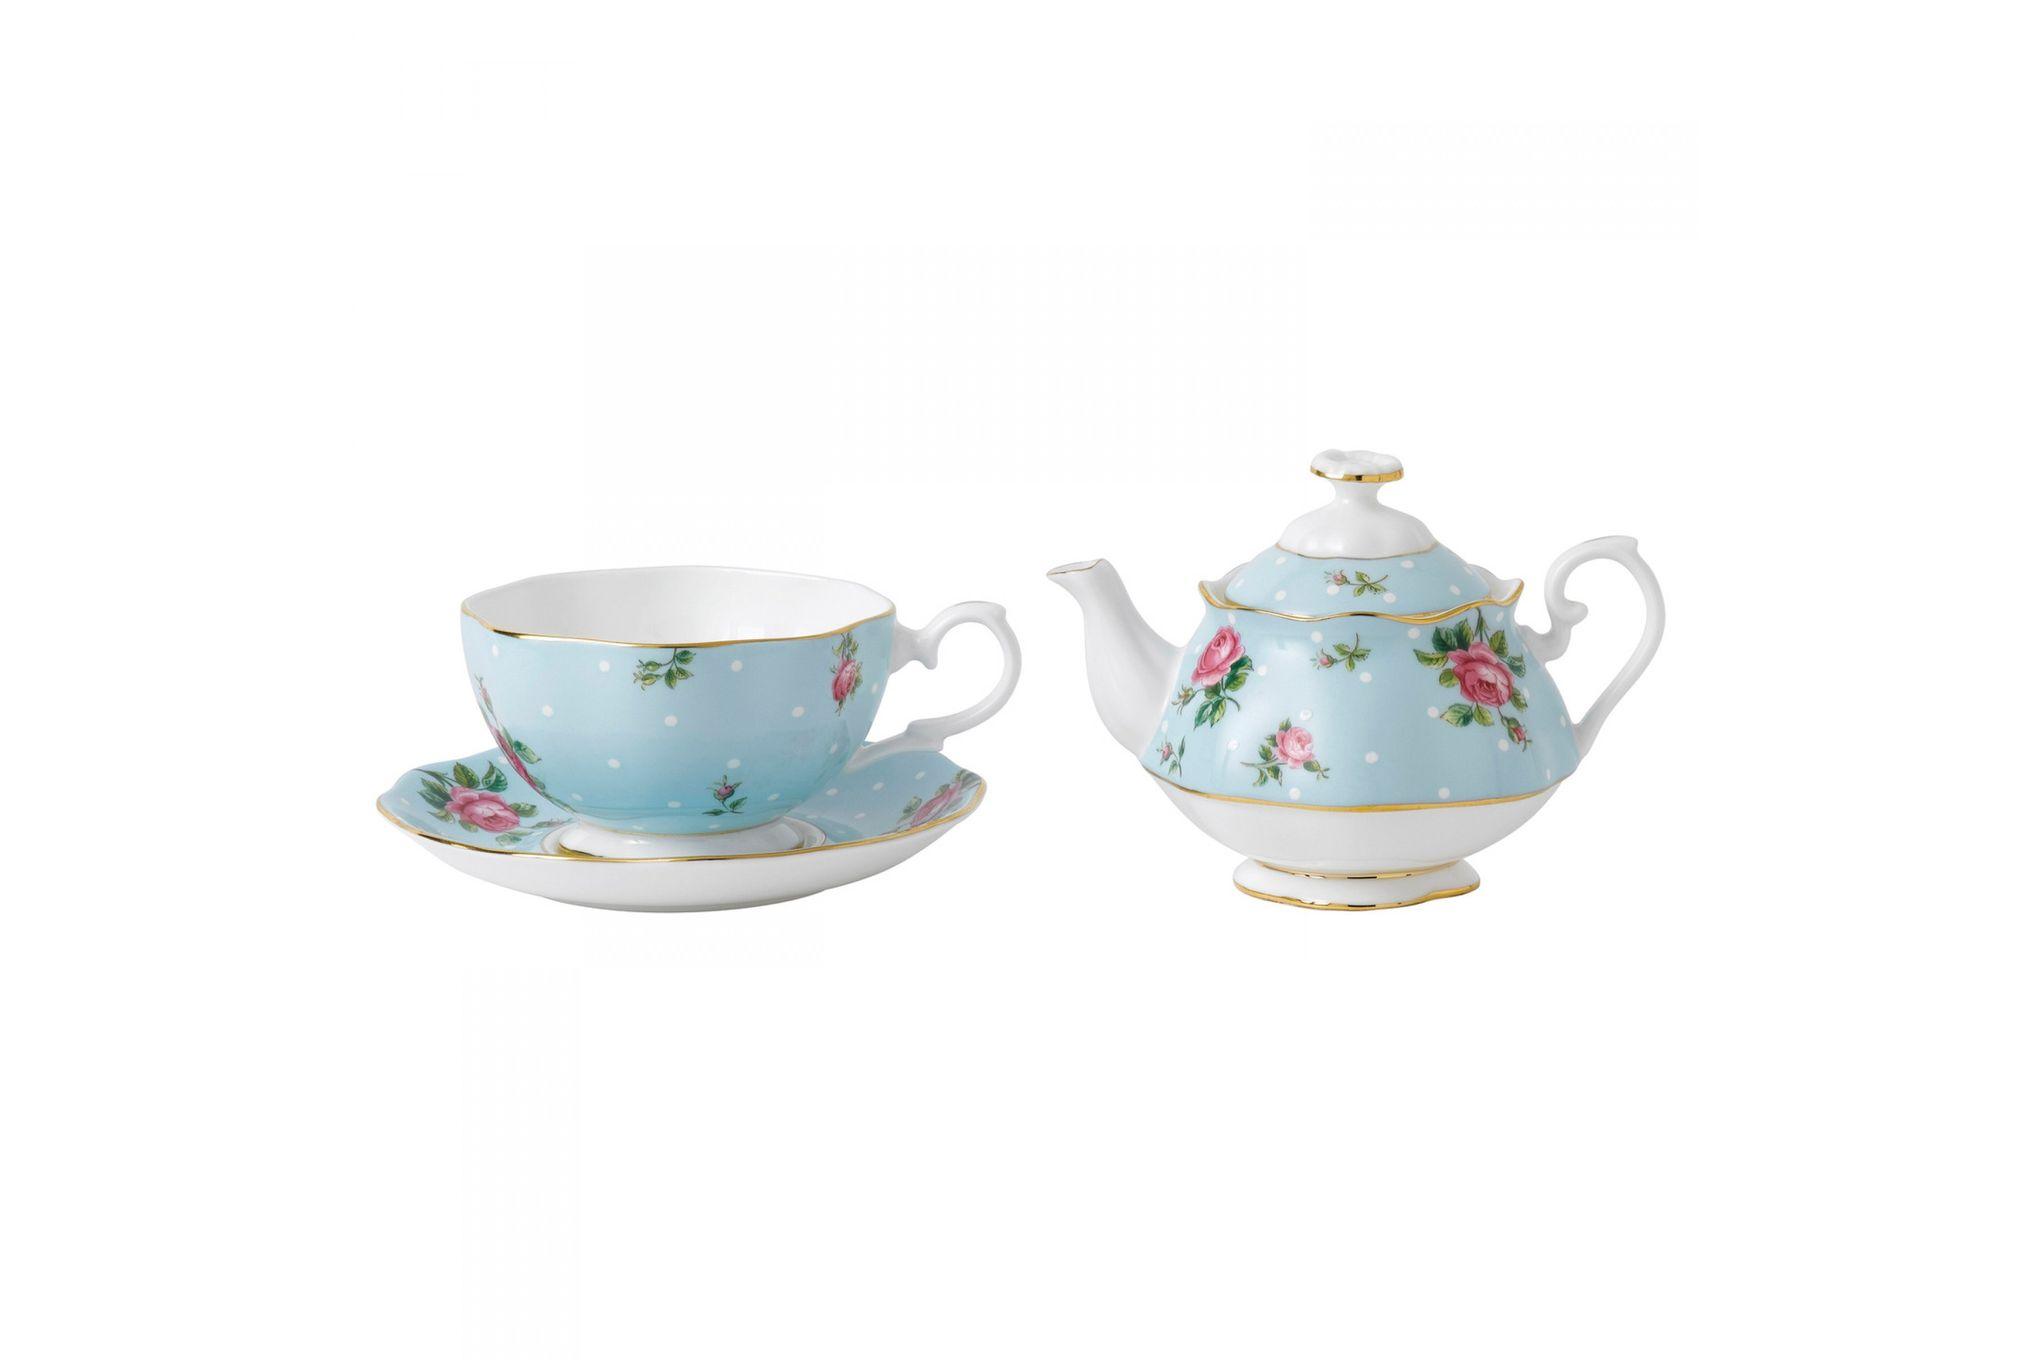 Royal Albert Polka Blue Tea For One thumb 2